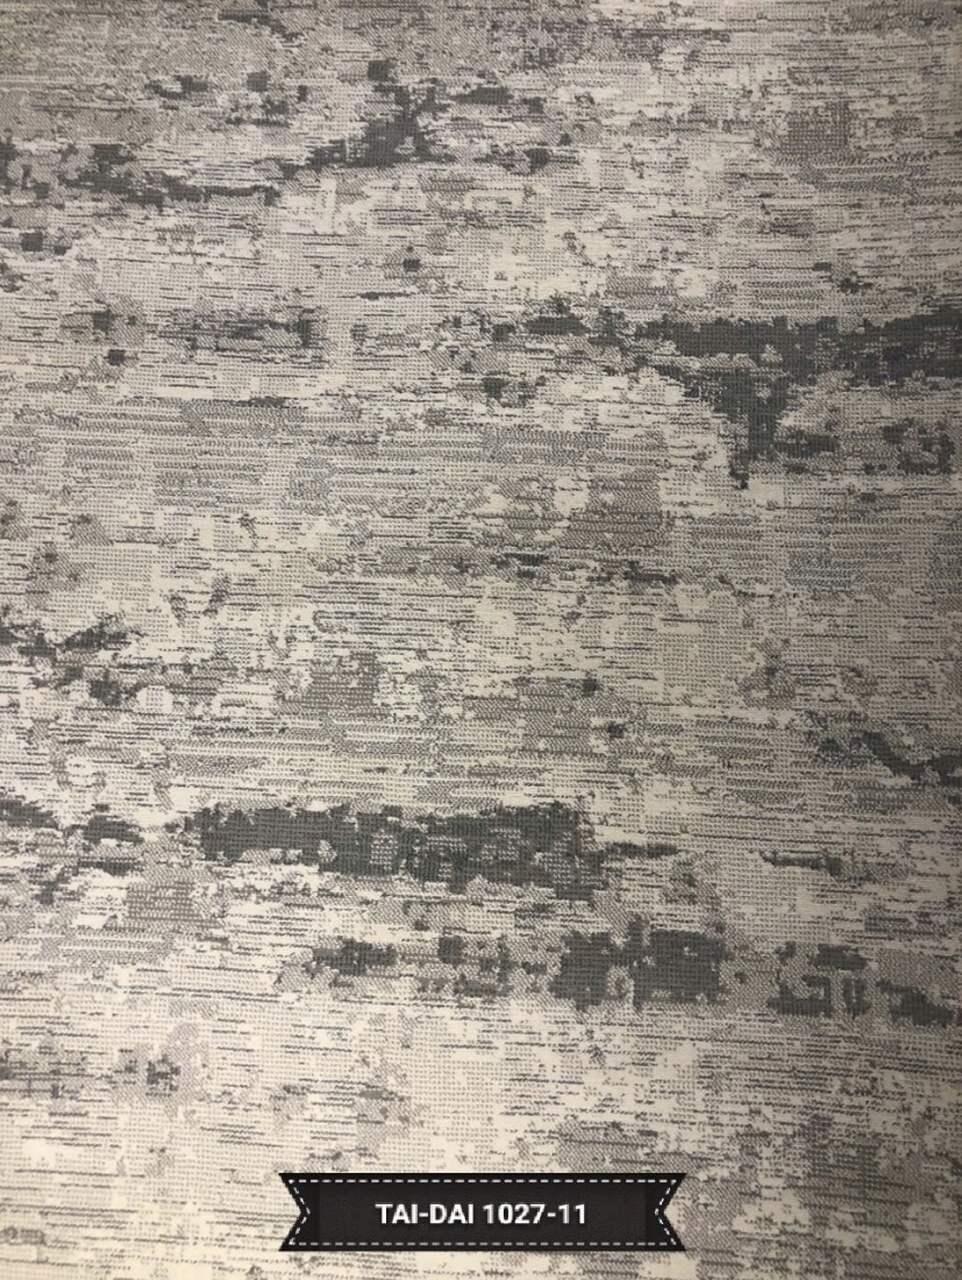 Tapete Tai Dai ref. 1027-11 - 200 x 300 cm